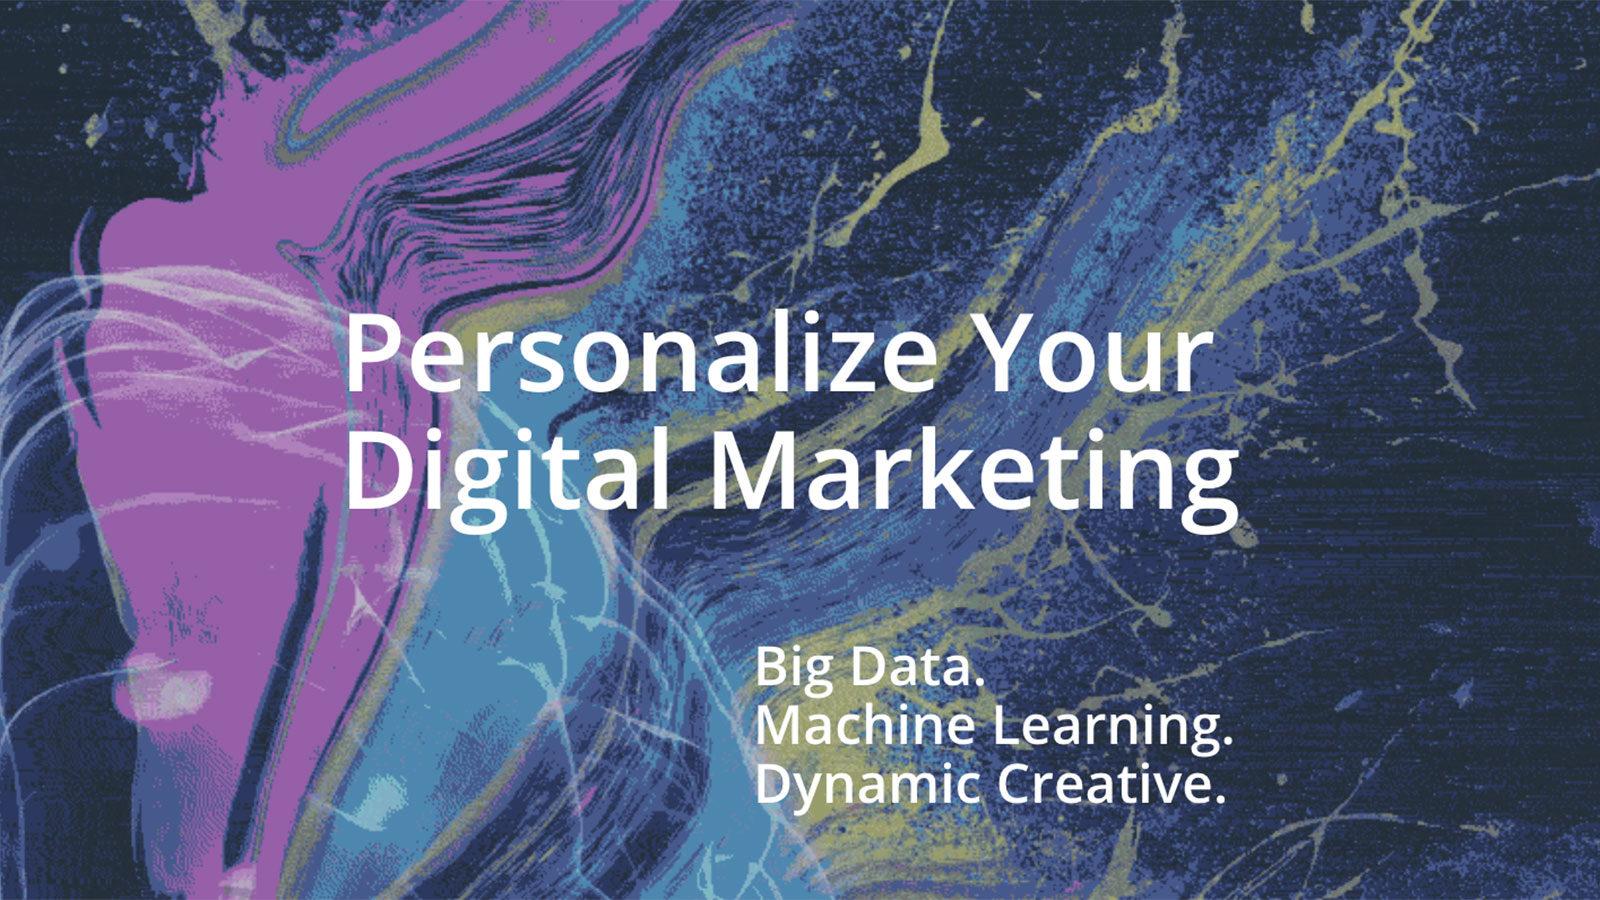 AIでデジタルマーケティングを個人最適化するJivox